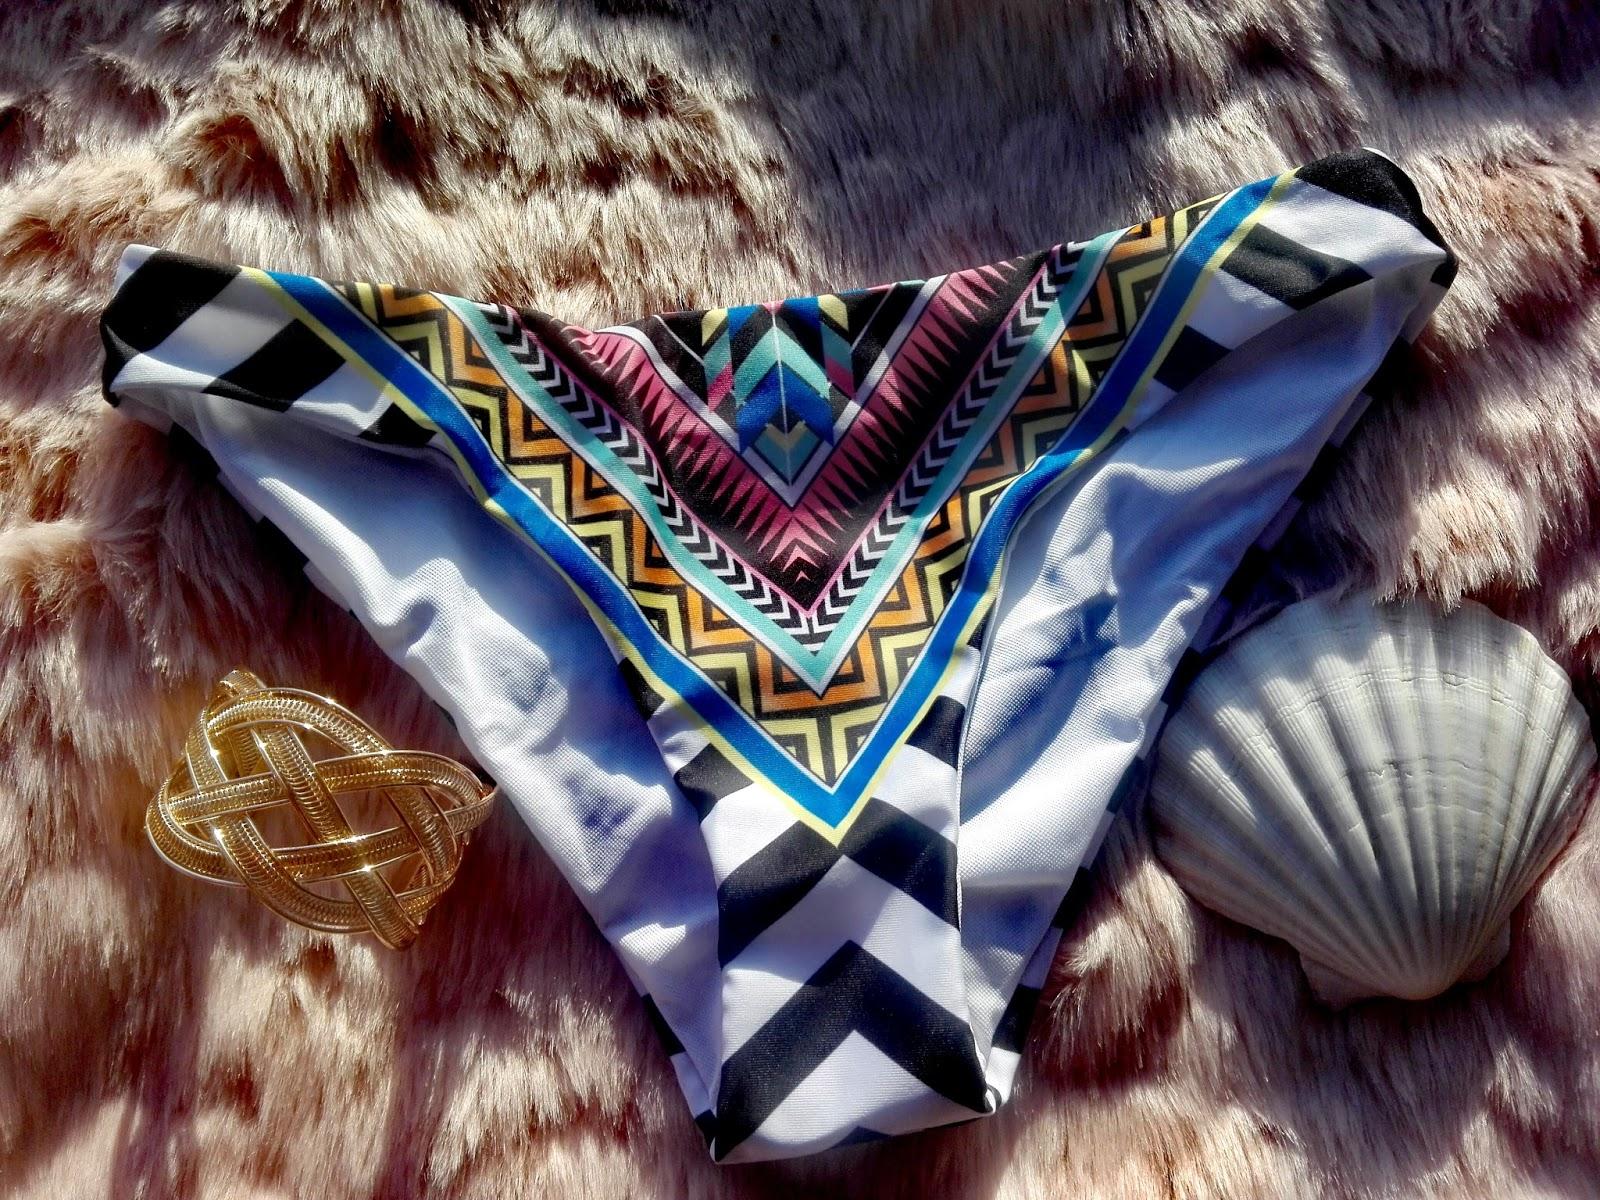 http://www.zaful.com/strappy-patterned-bikini-p_255748.html?lkid=24467